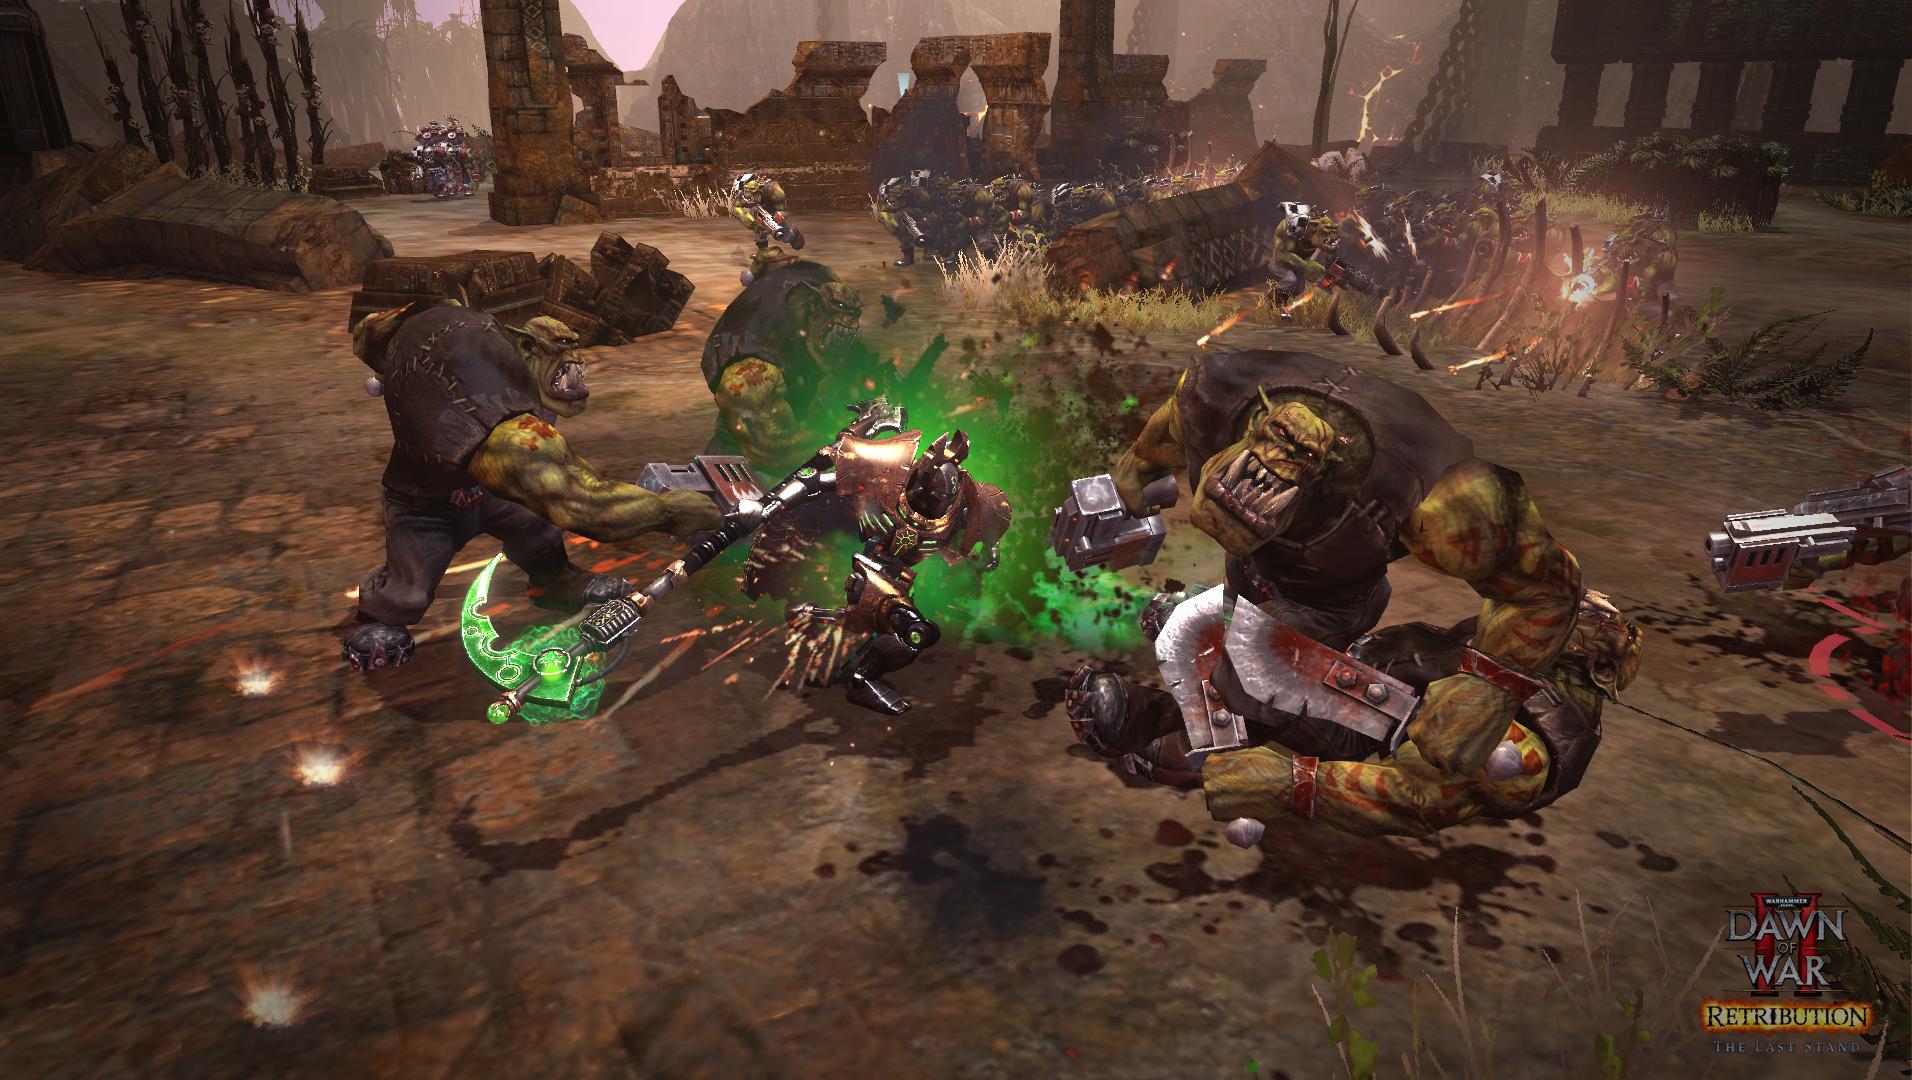 Ролевая игра warhammer 40 000 последняя война life is feudal forest village trainer 2017